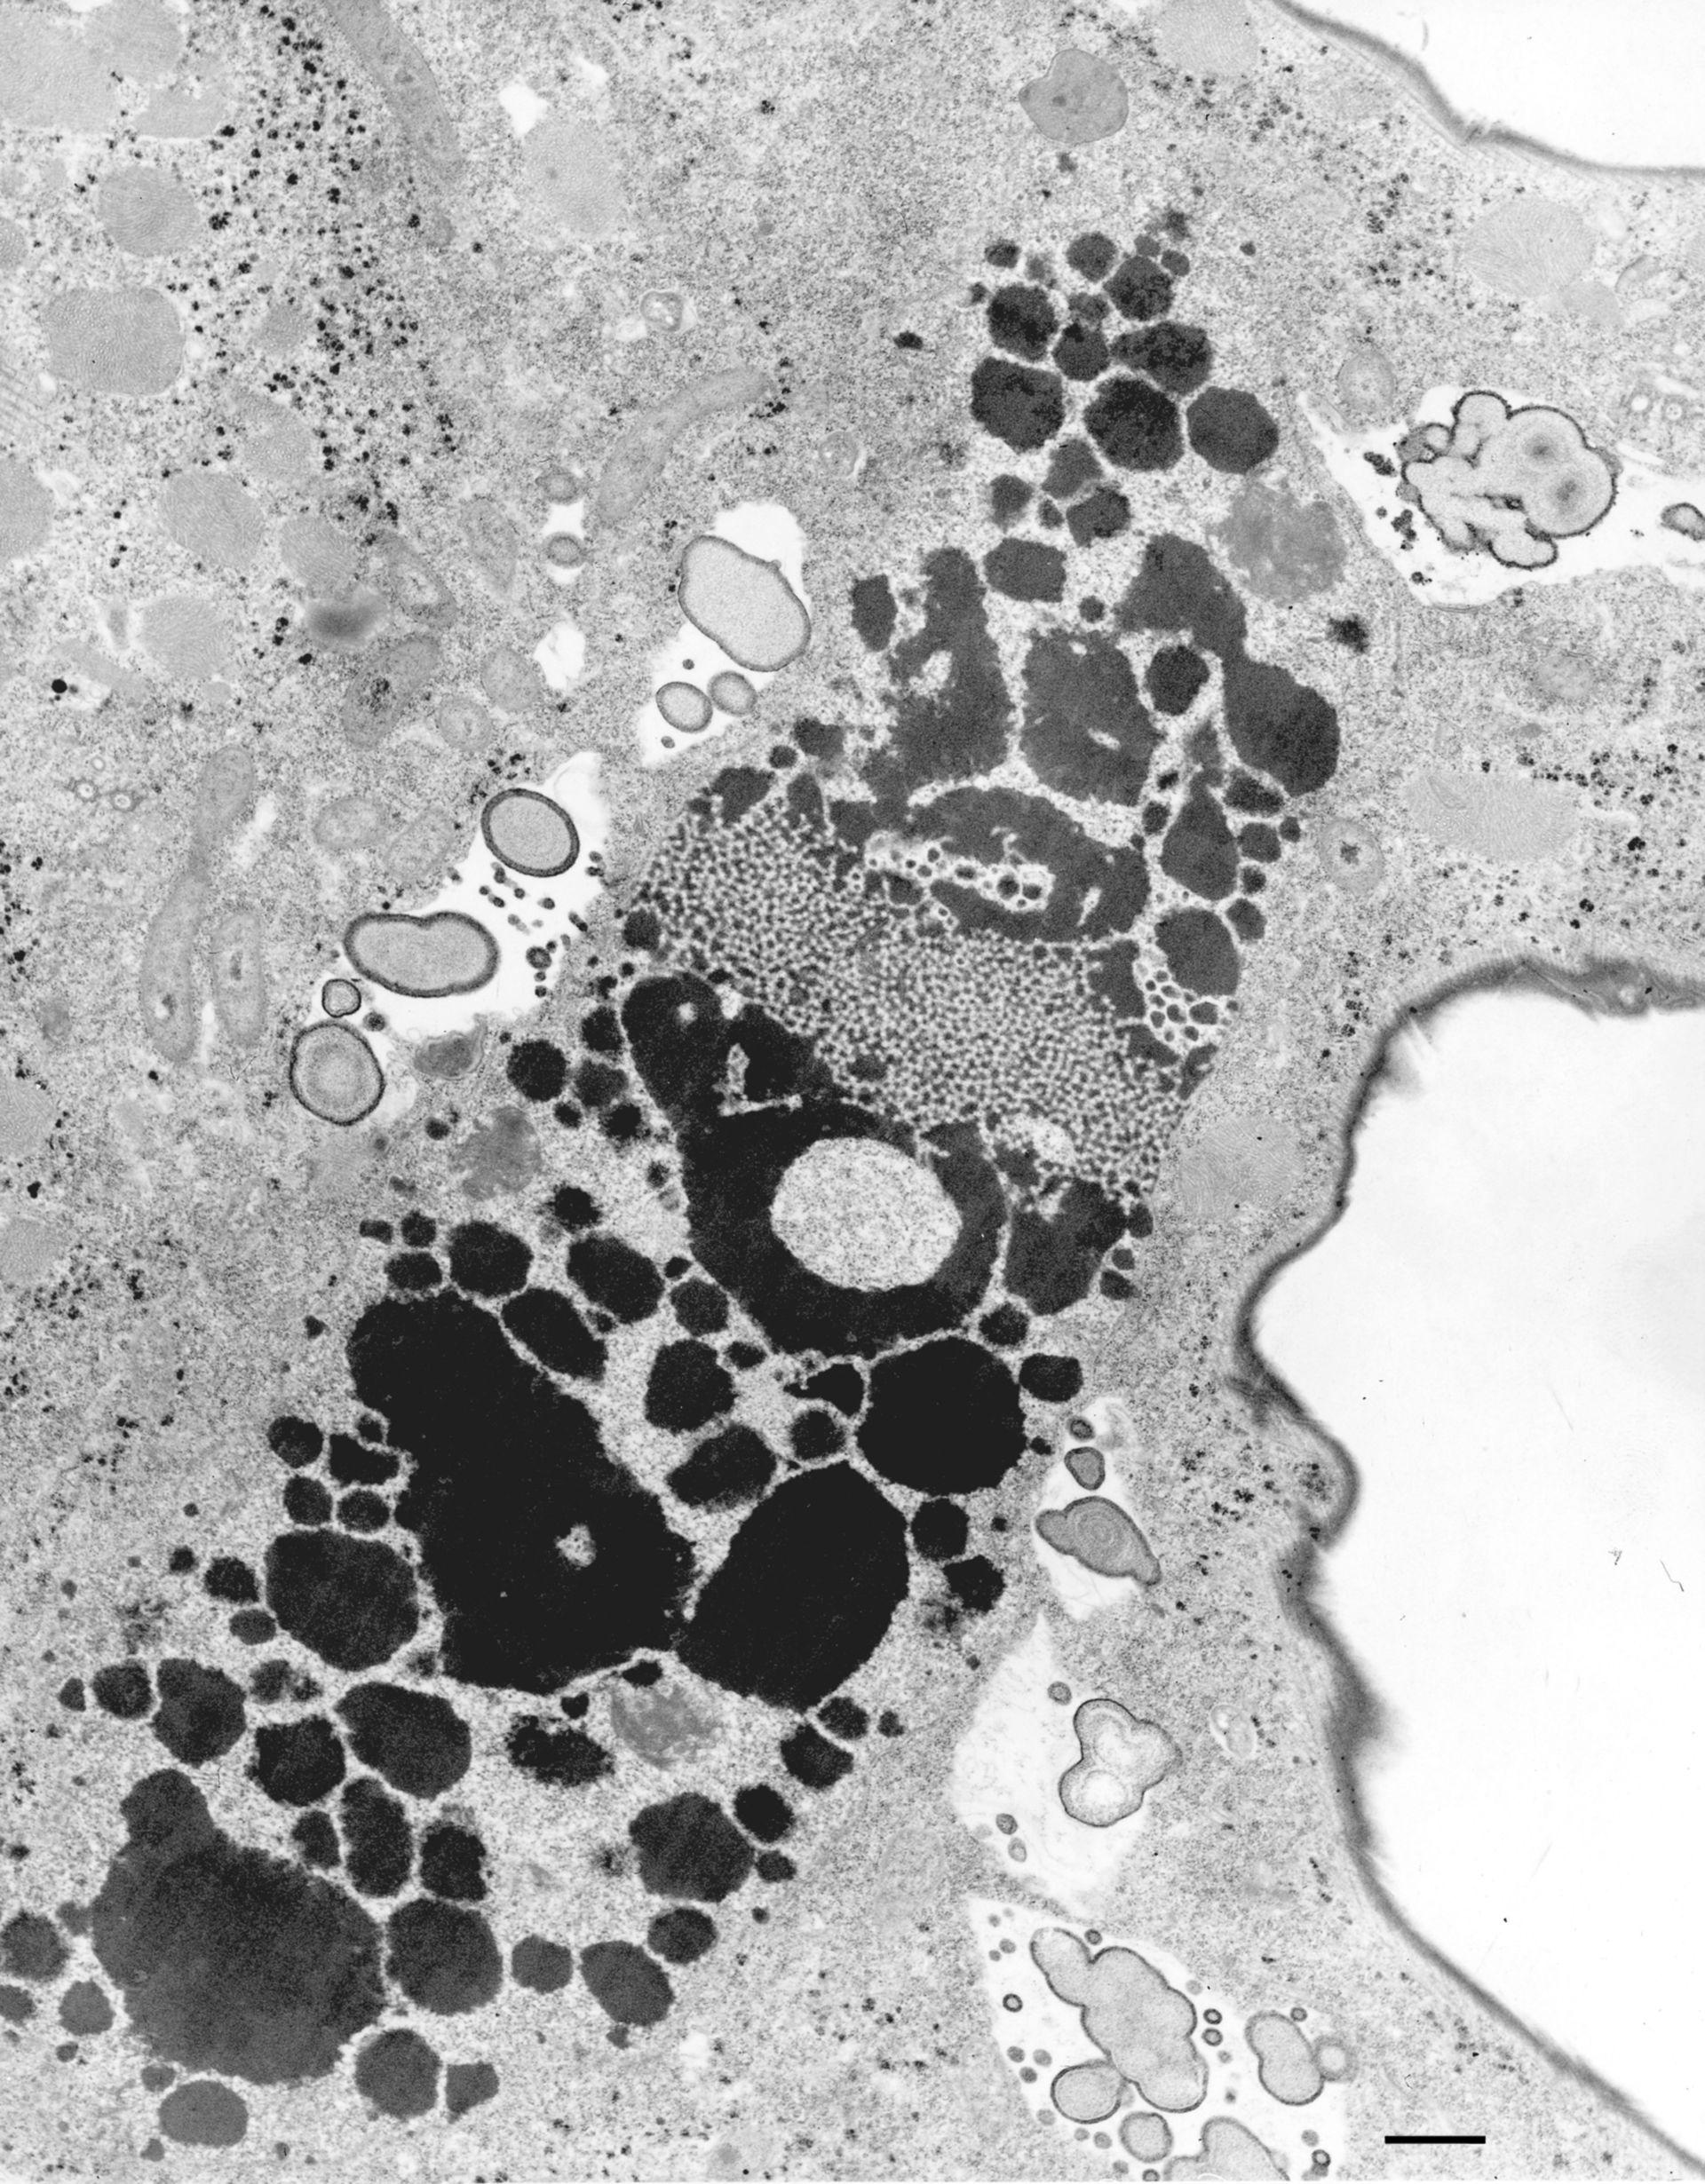 Euplotes sp. (Contractile vacuole) - CIL:12334